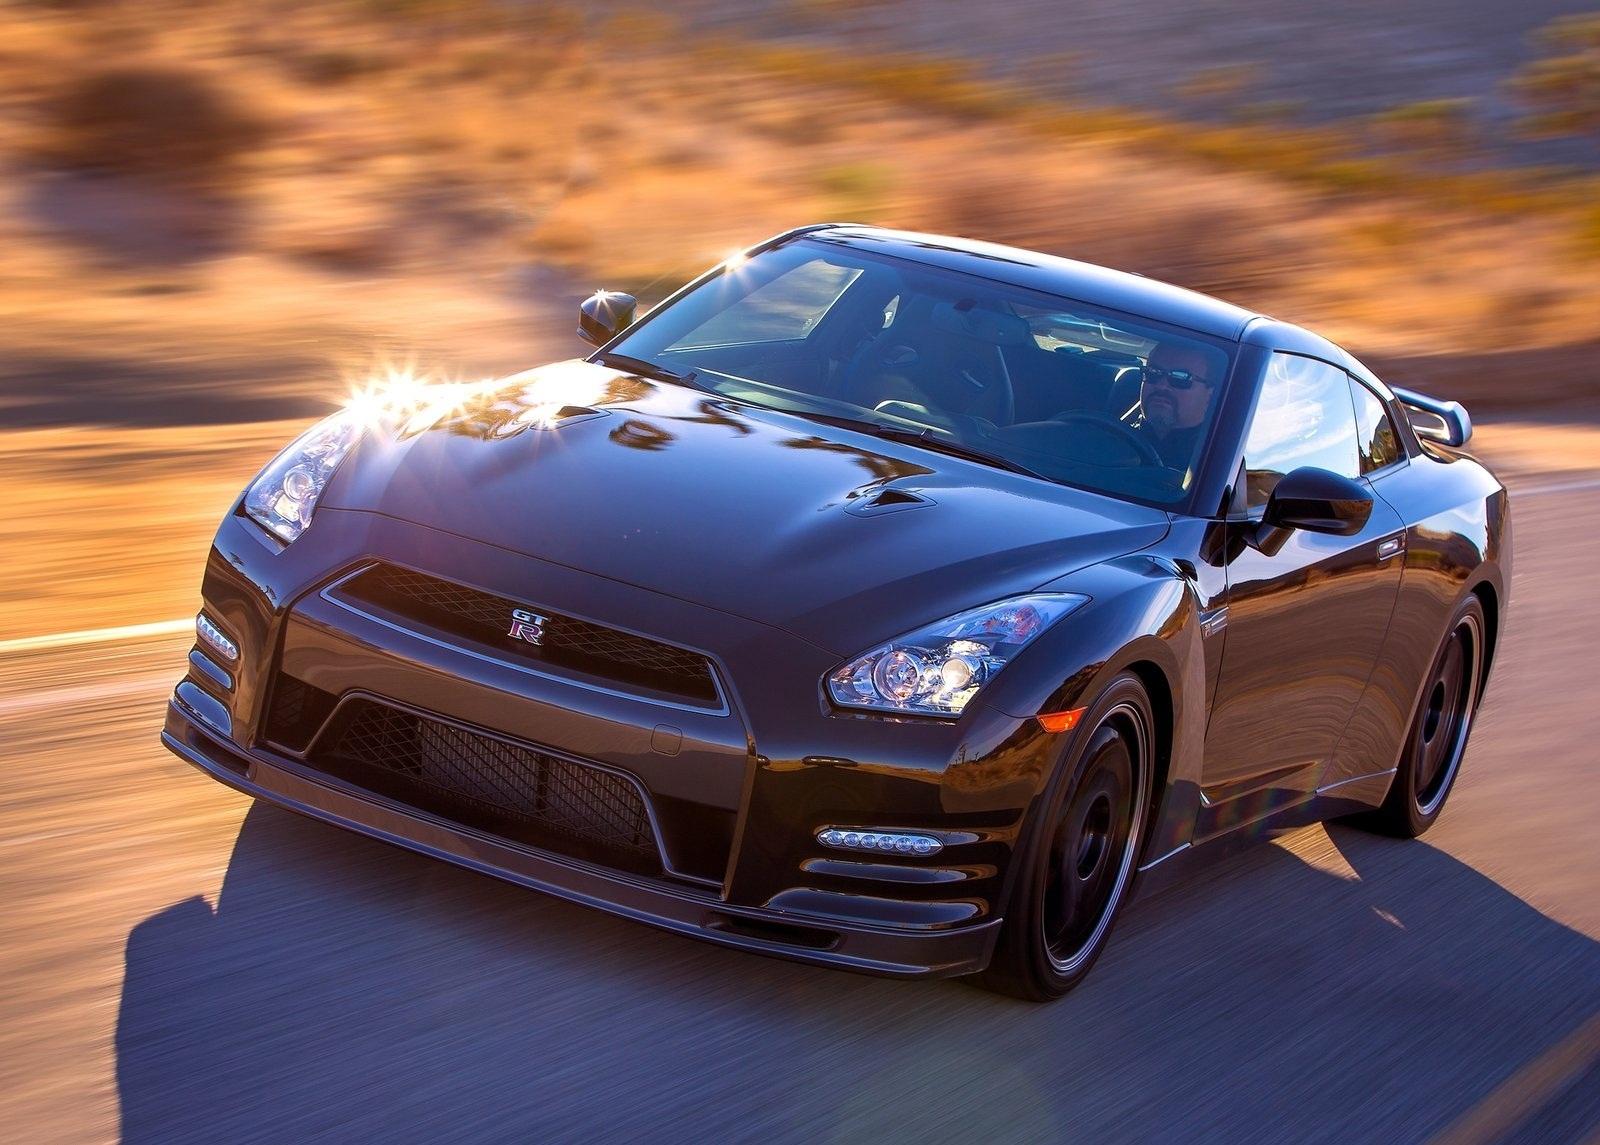 Nissan-GT-R_Track_Edition_2014_1600x1200_wallpaper_05